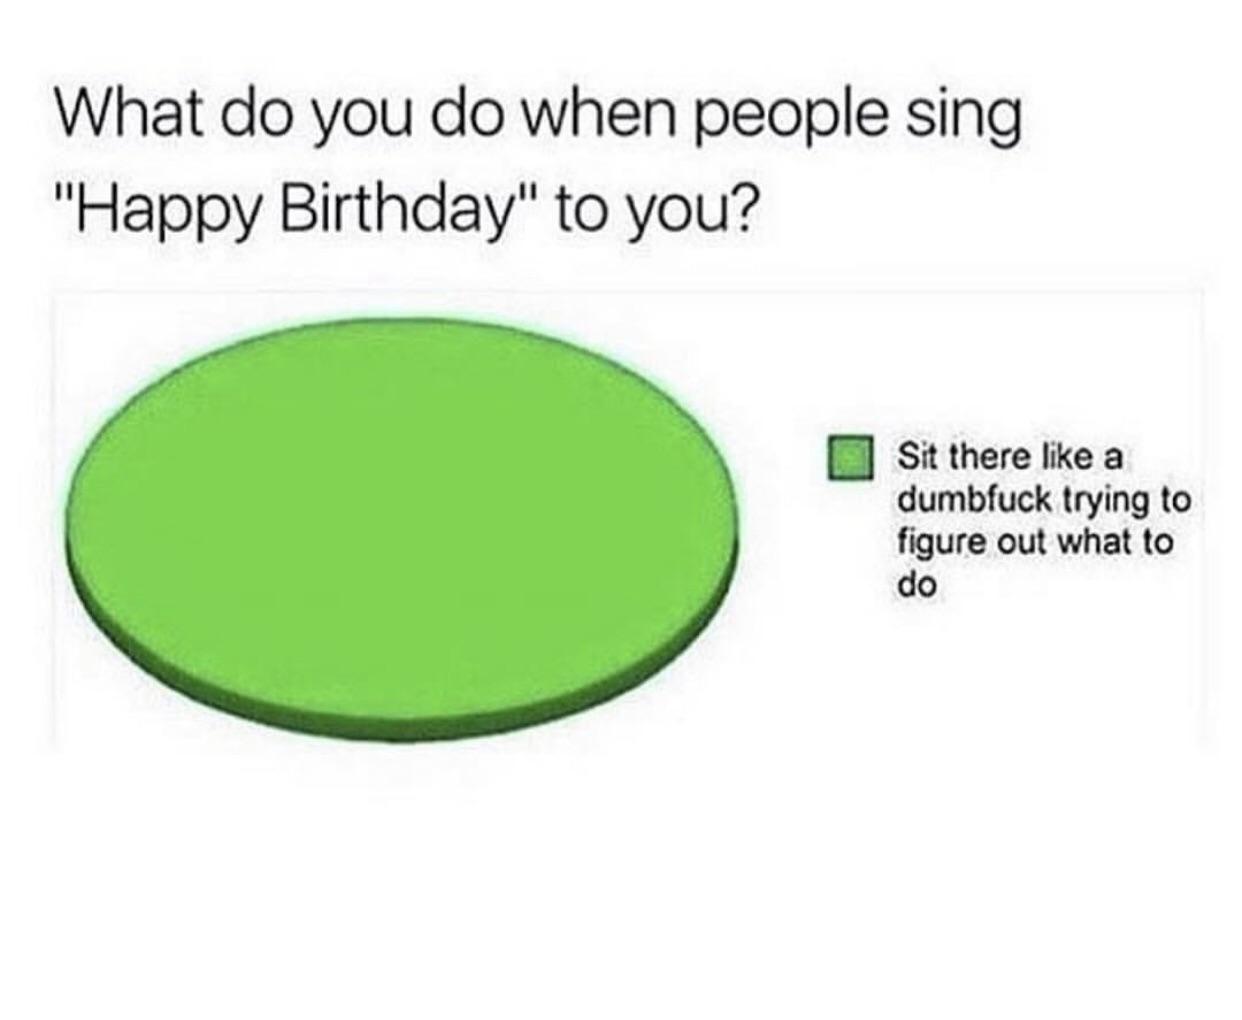 Reality of everyones birthday!